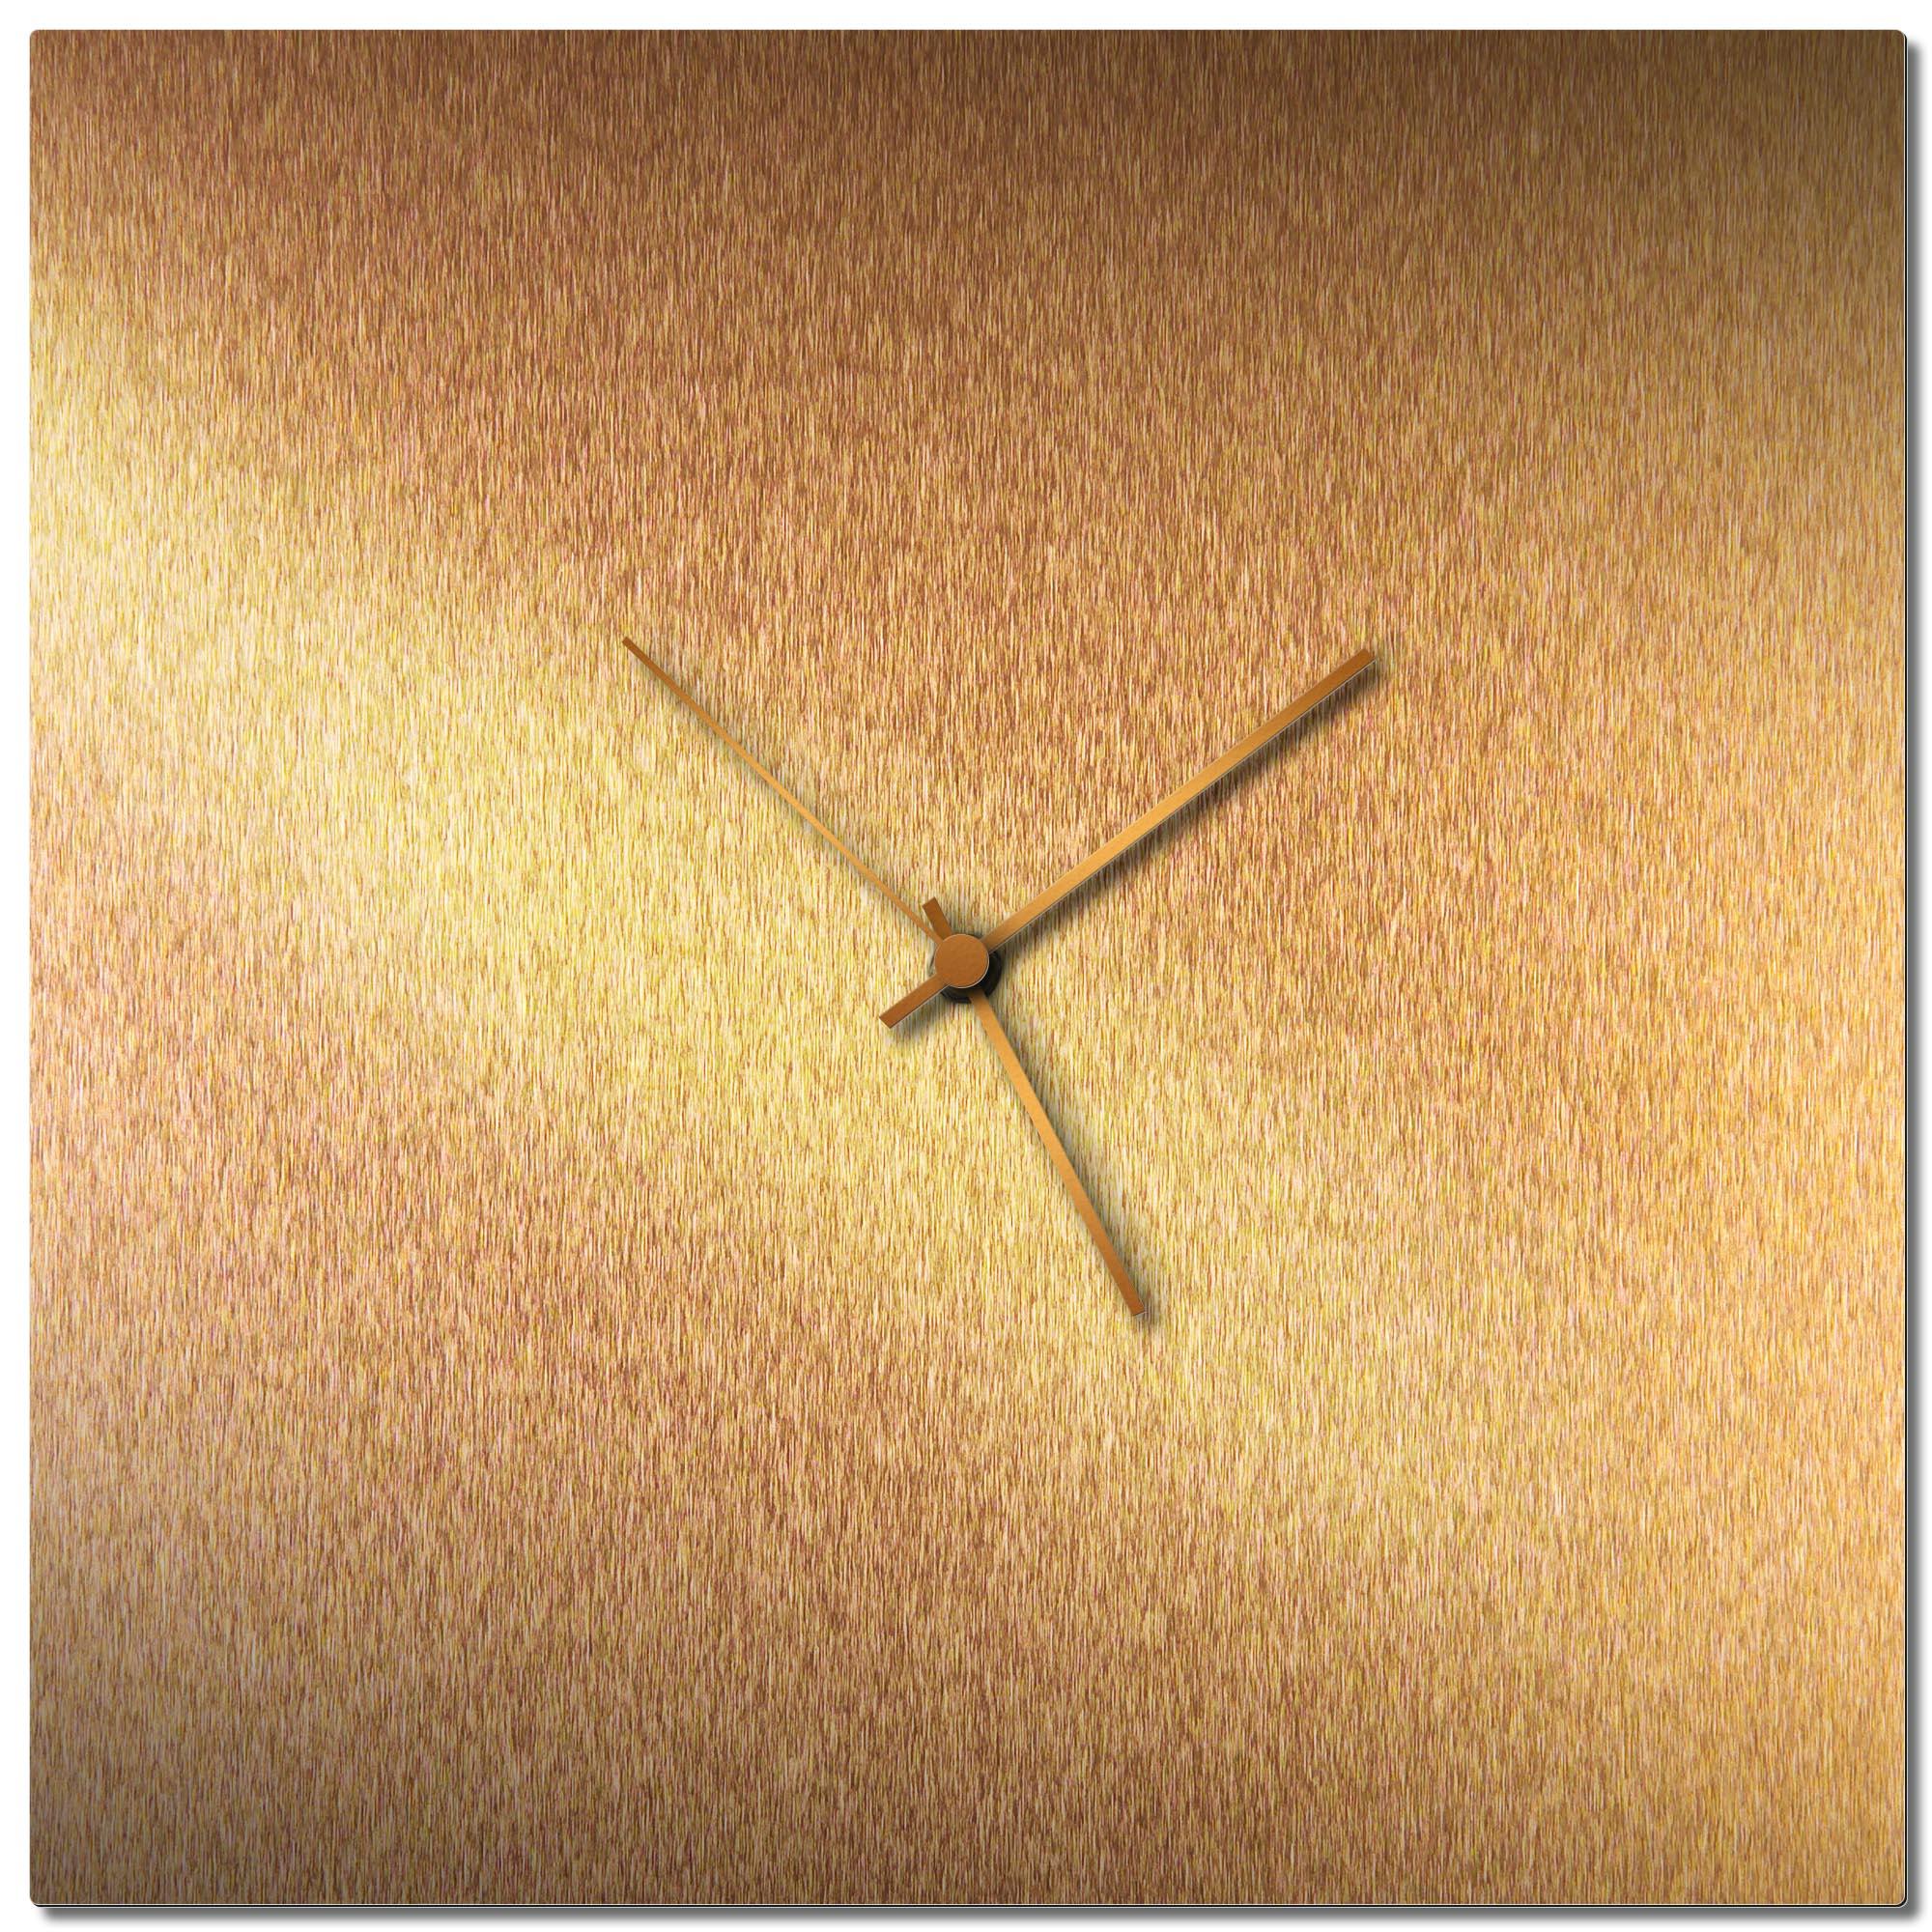 Adam Schwoeppe 'Bronzesmith Square Clock Large Bronze' Midcentury Modern Style Wall Clock